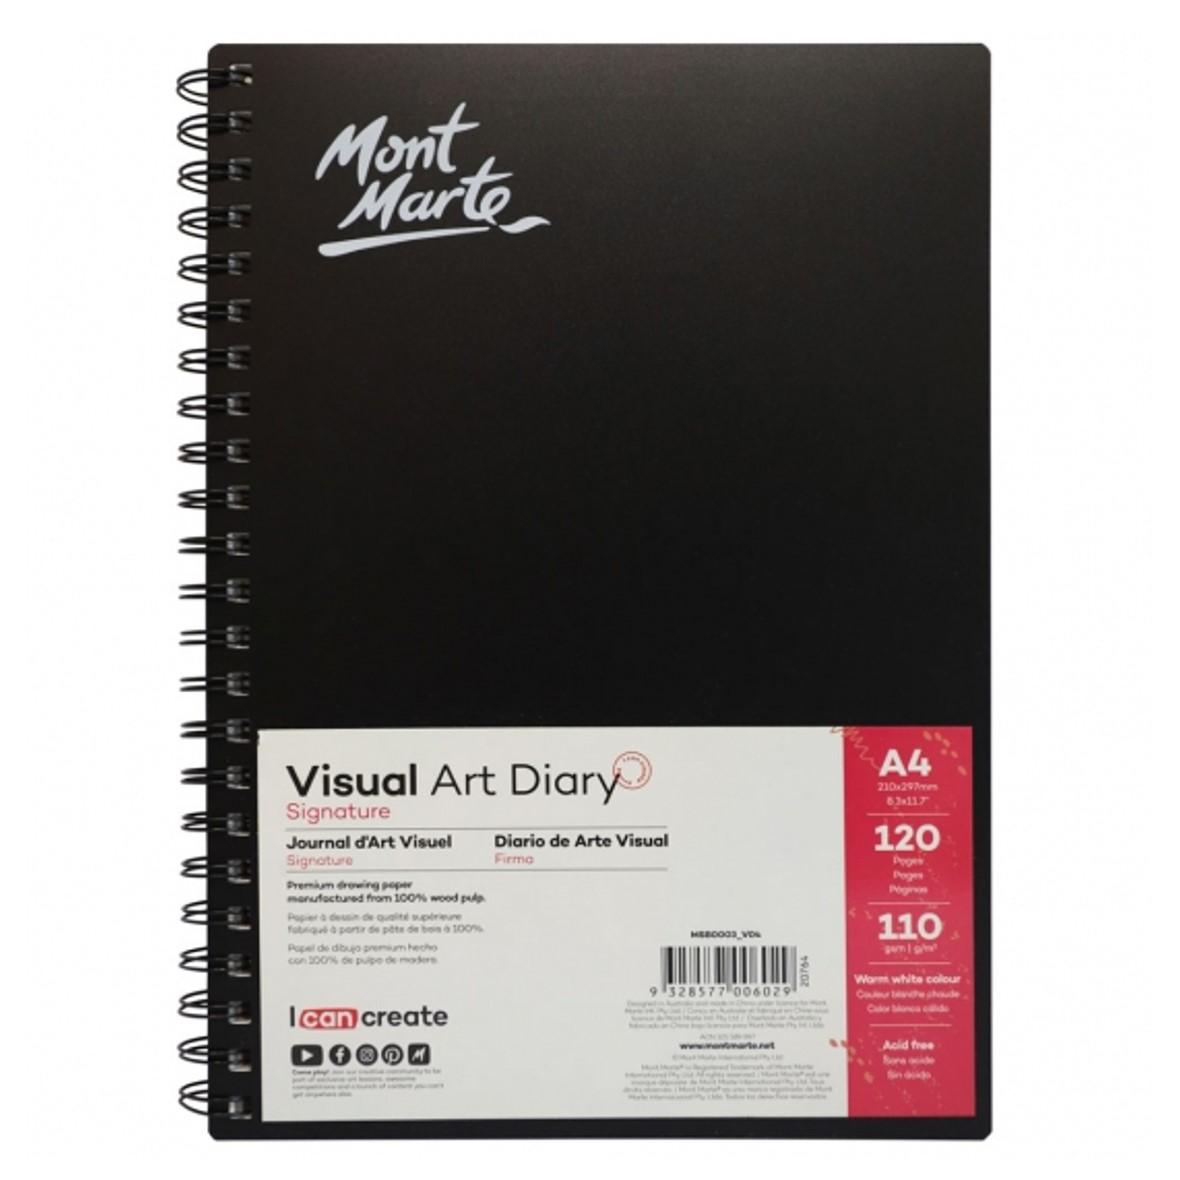 A4 Visual Diary